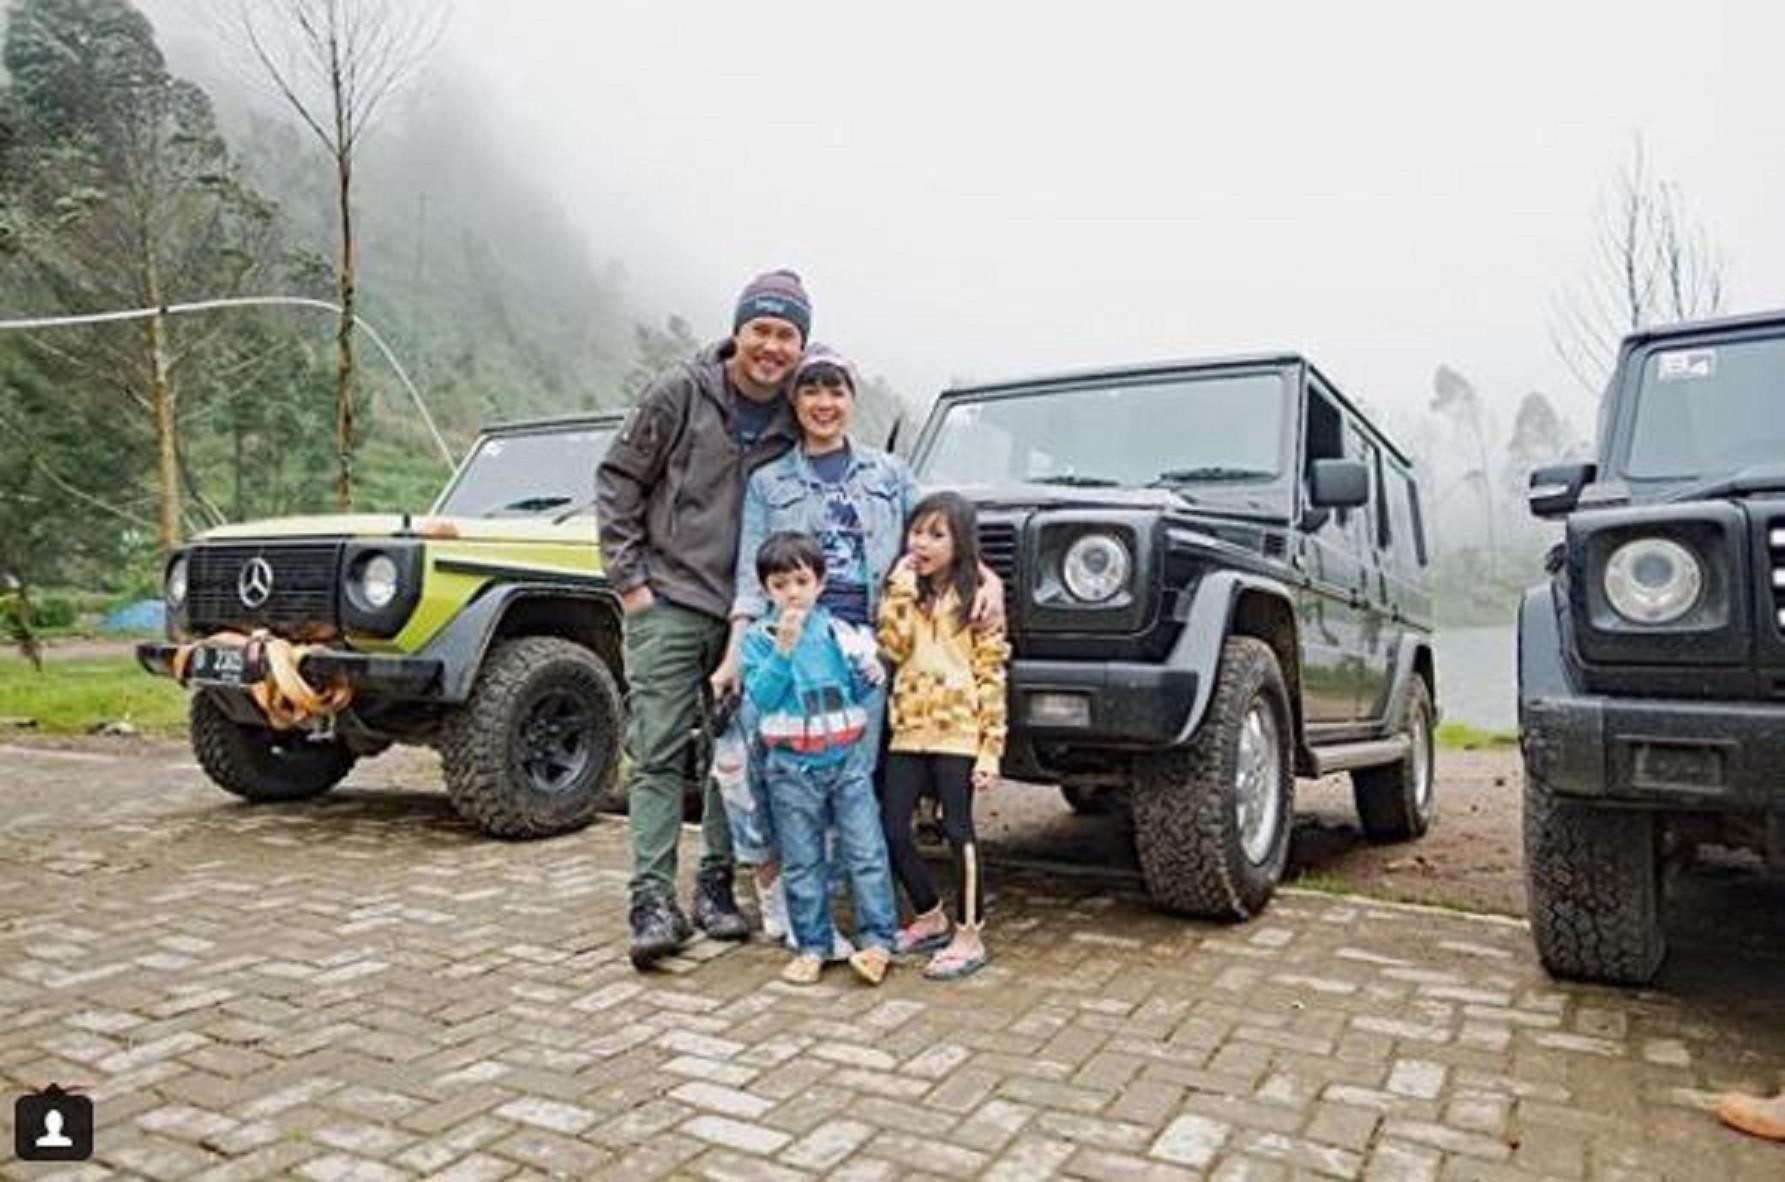 Nirina Zubir dan Ernest Fardiyan Syarif bersama kedua anak mereka (Instagram/@nirinazubir)